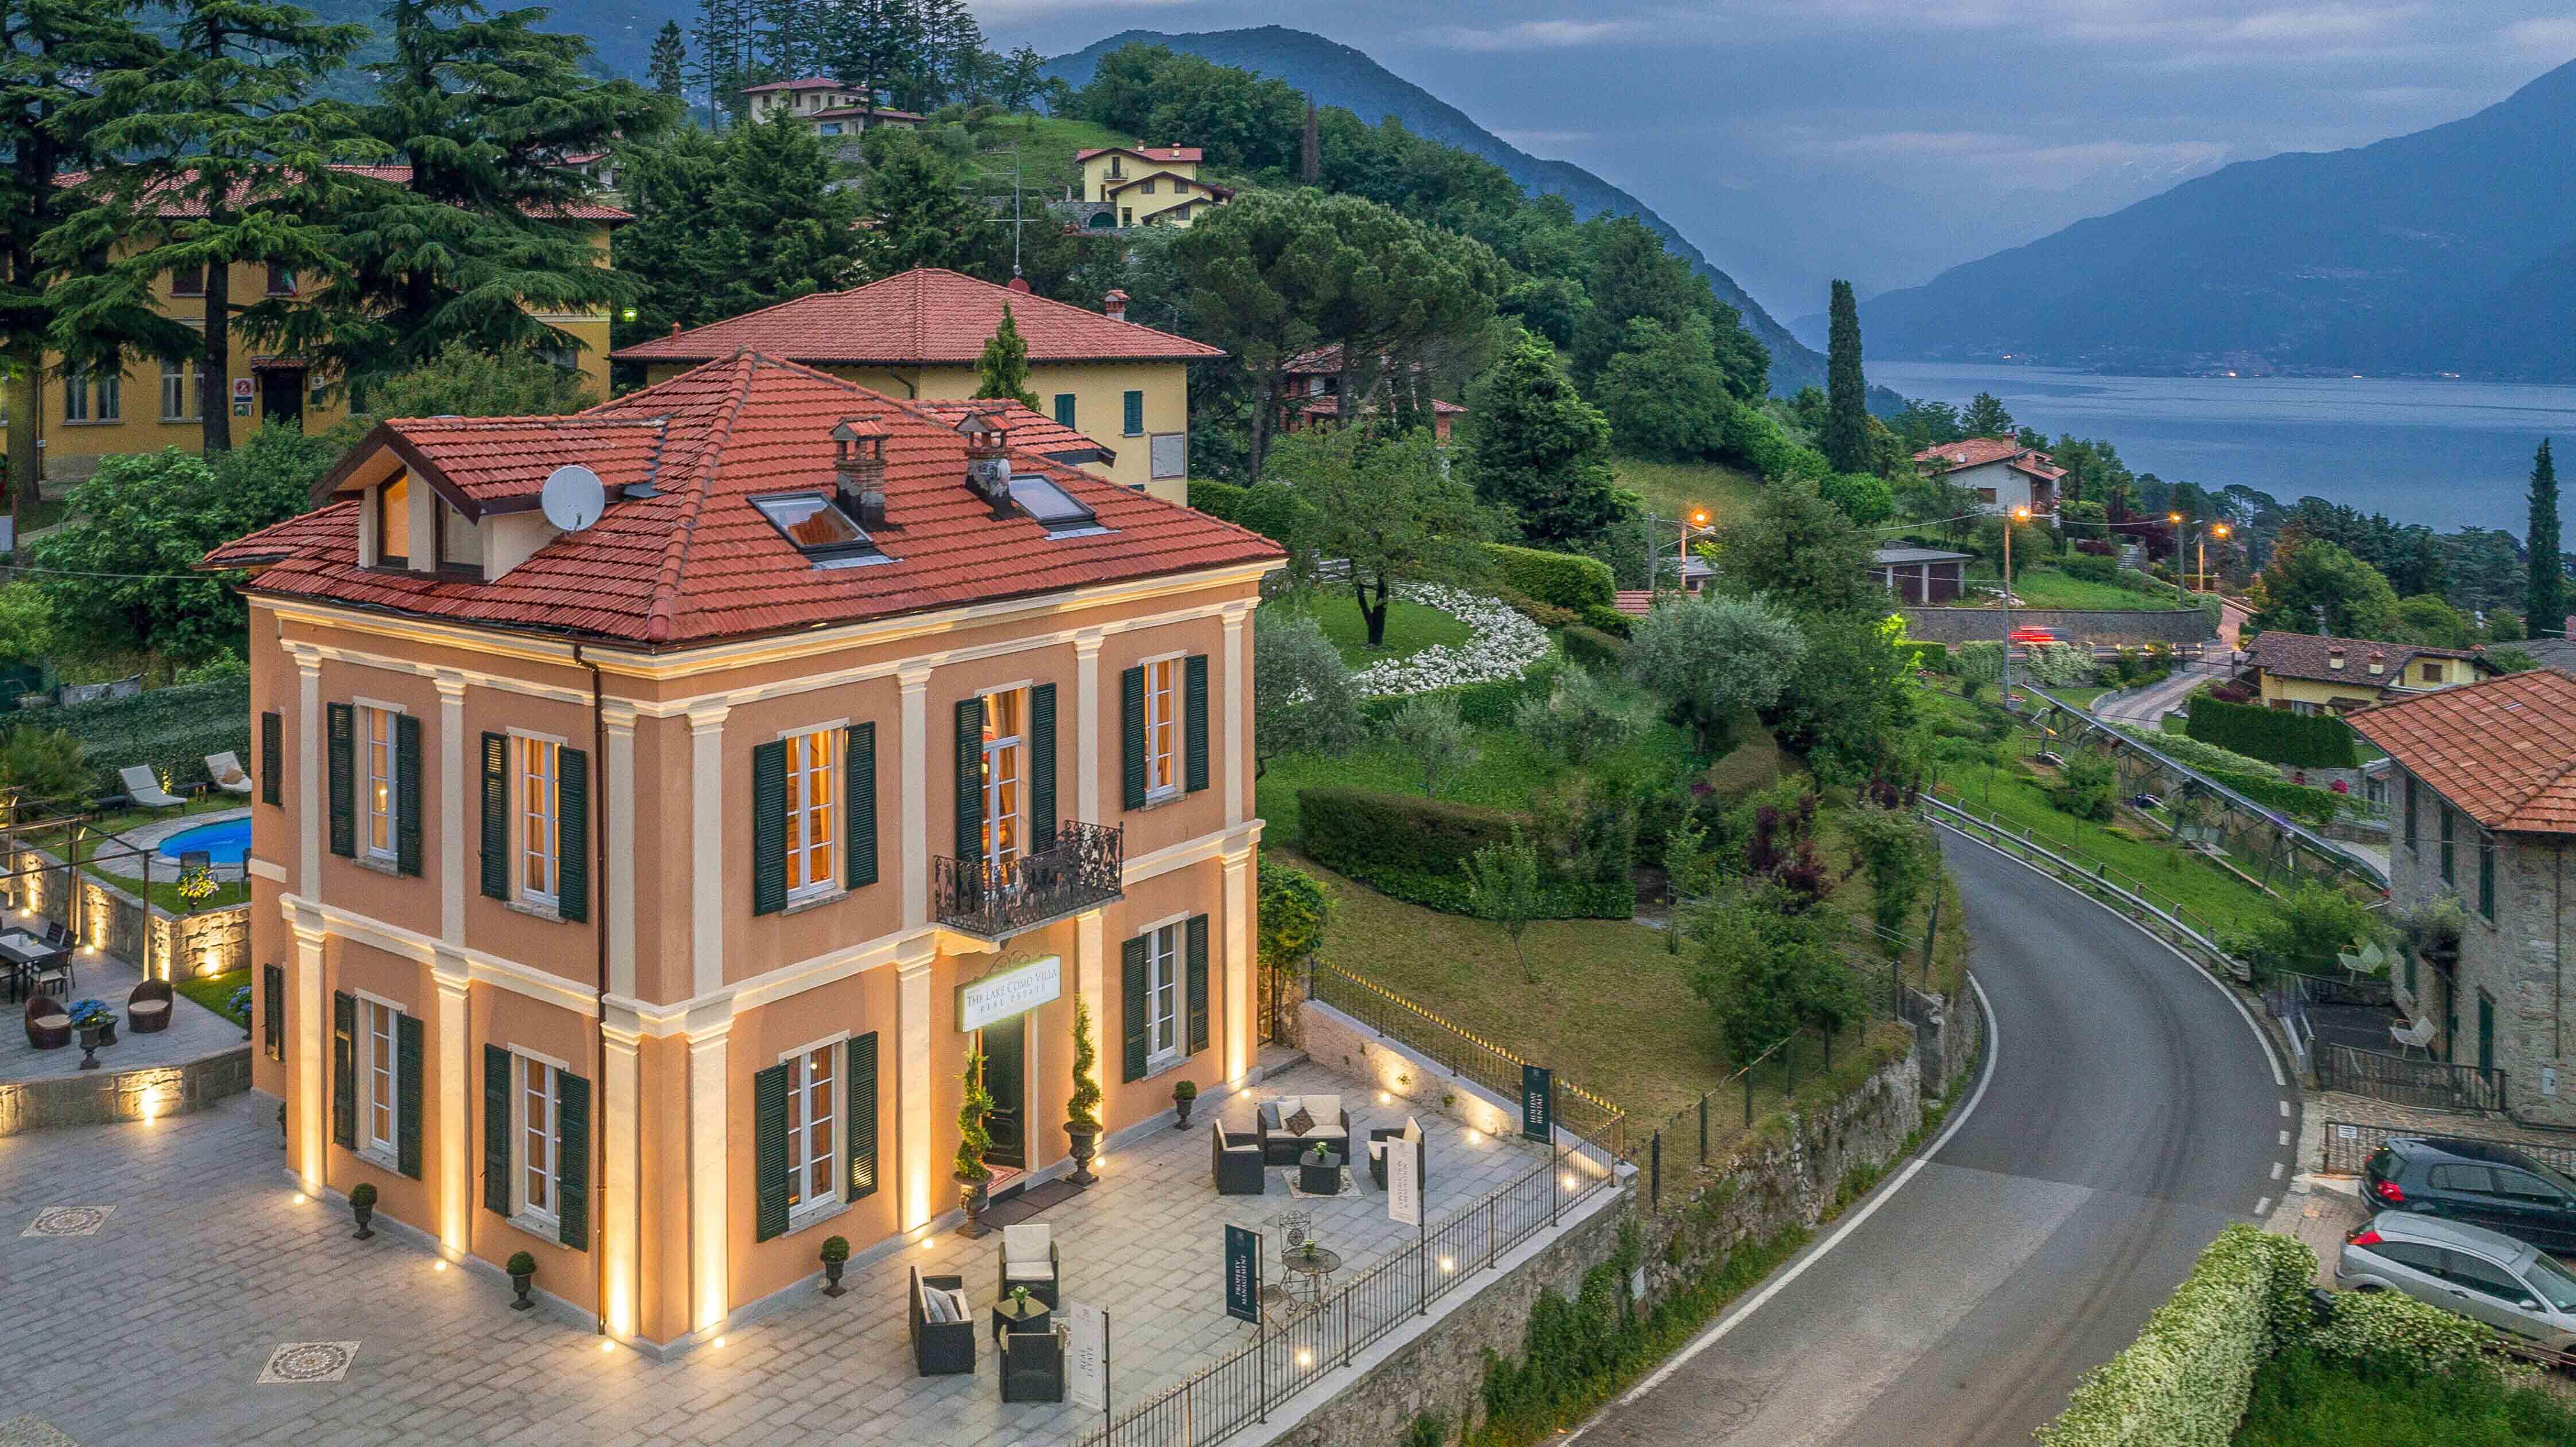 About - Lake Como Villas